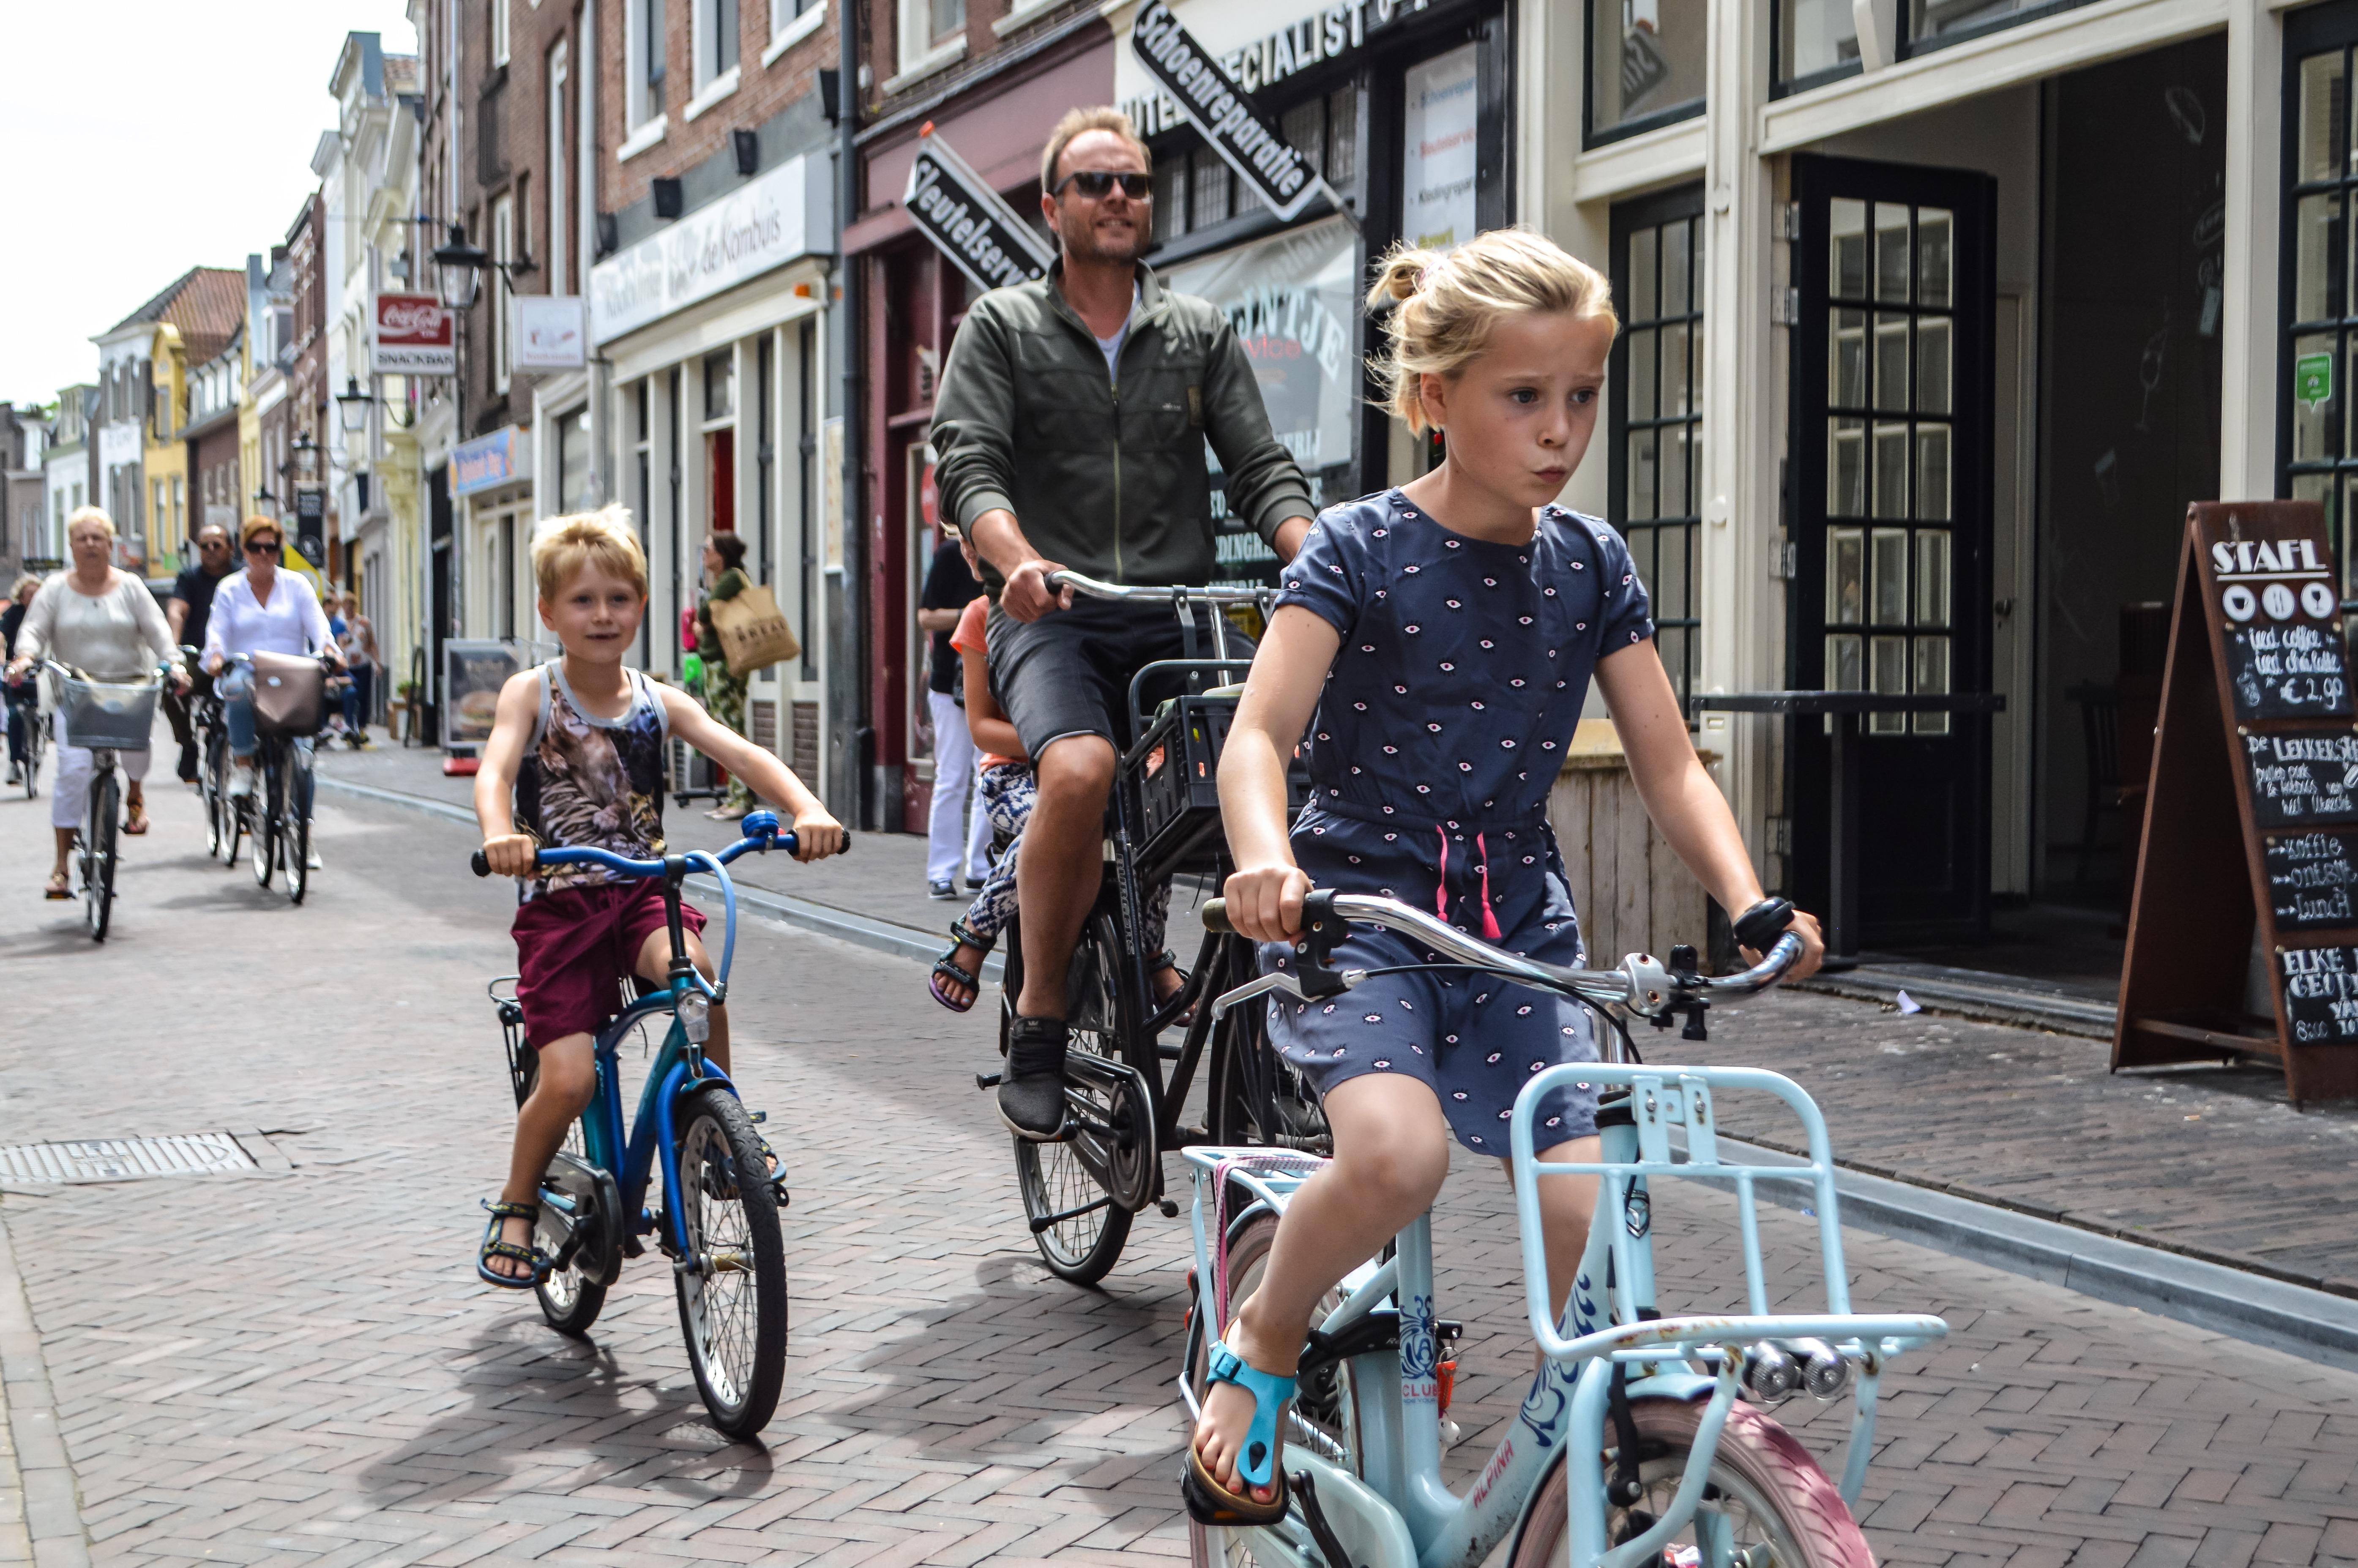 b539bd7d28e How the Dutch created a casual biking culture - Vox